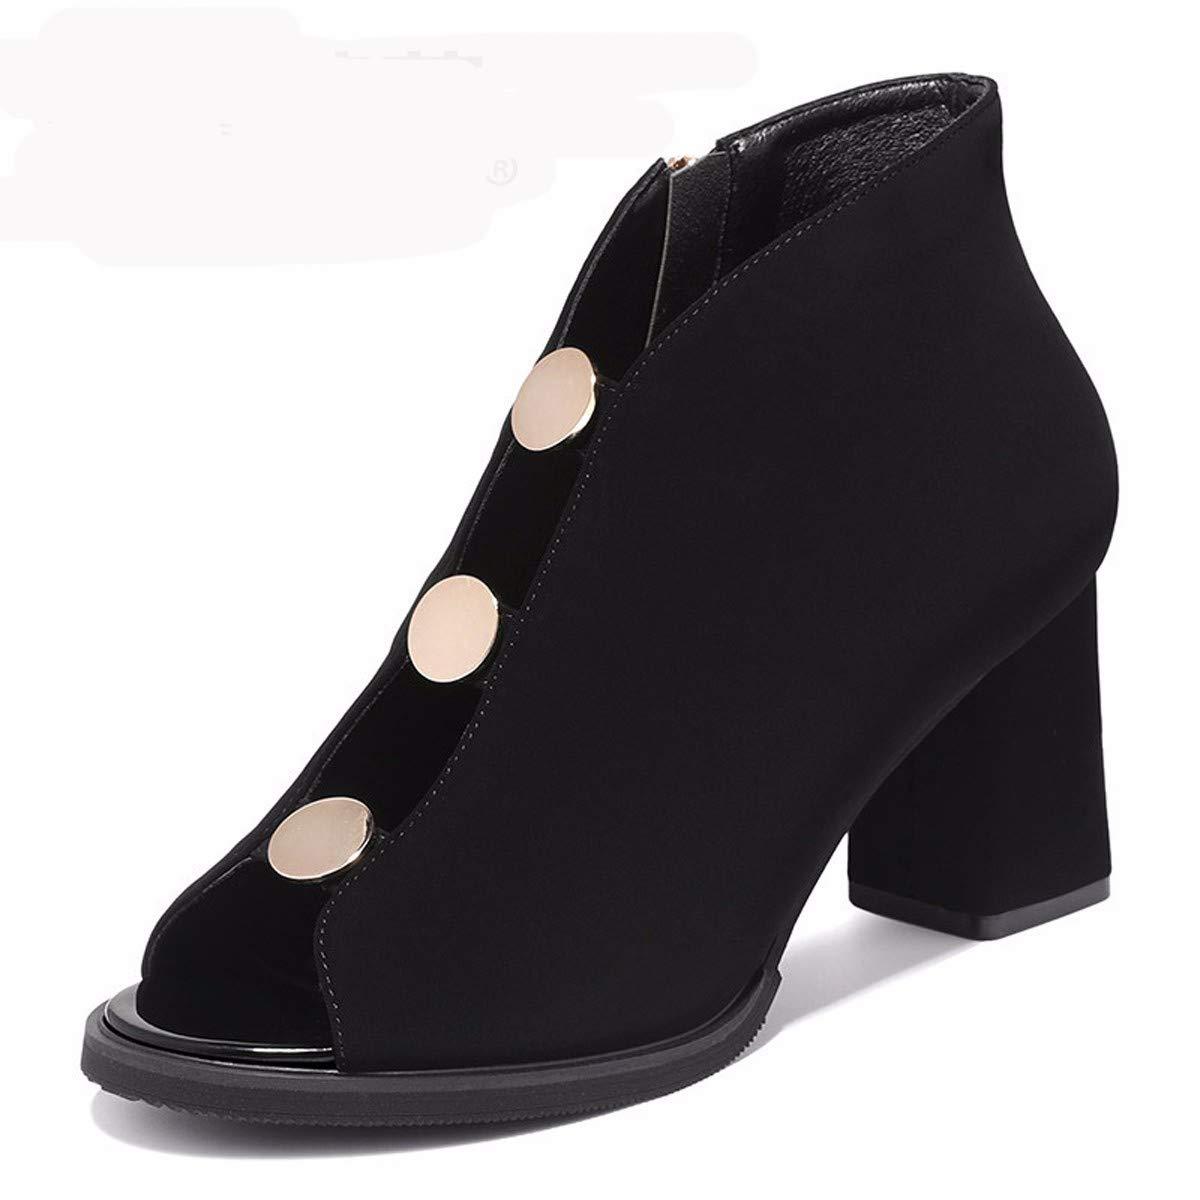 LBTSQ Damenschuhe Fishmouth Schuhe Heel 7 cm Im Frühling Und Sommer Dicke Sohle Süß Atmungsaktiv Abzug Sandalen